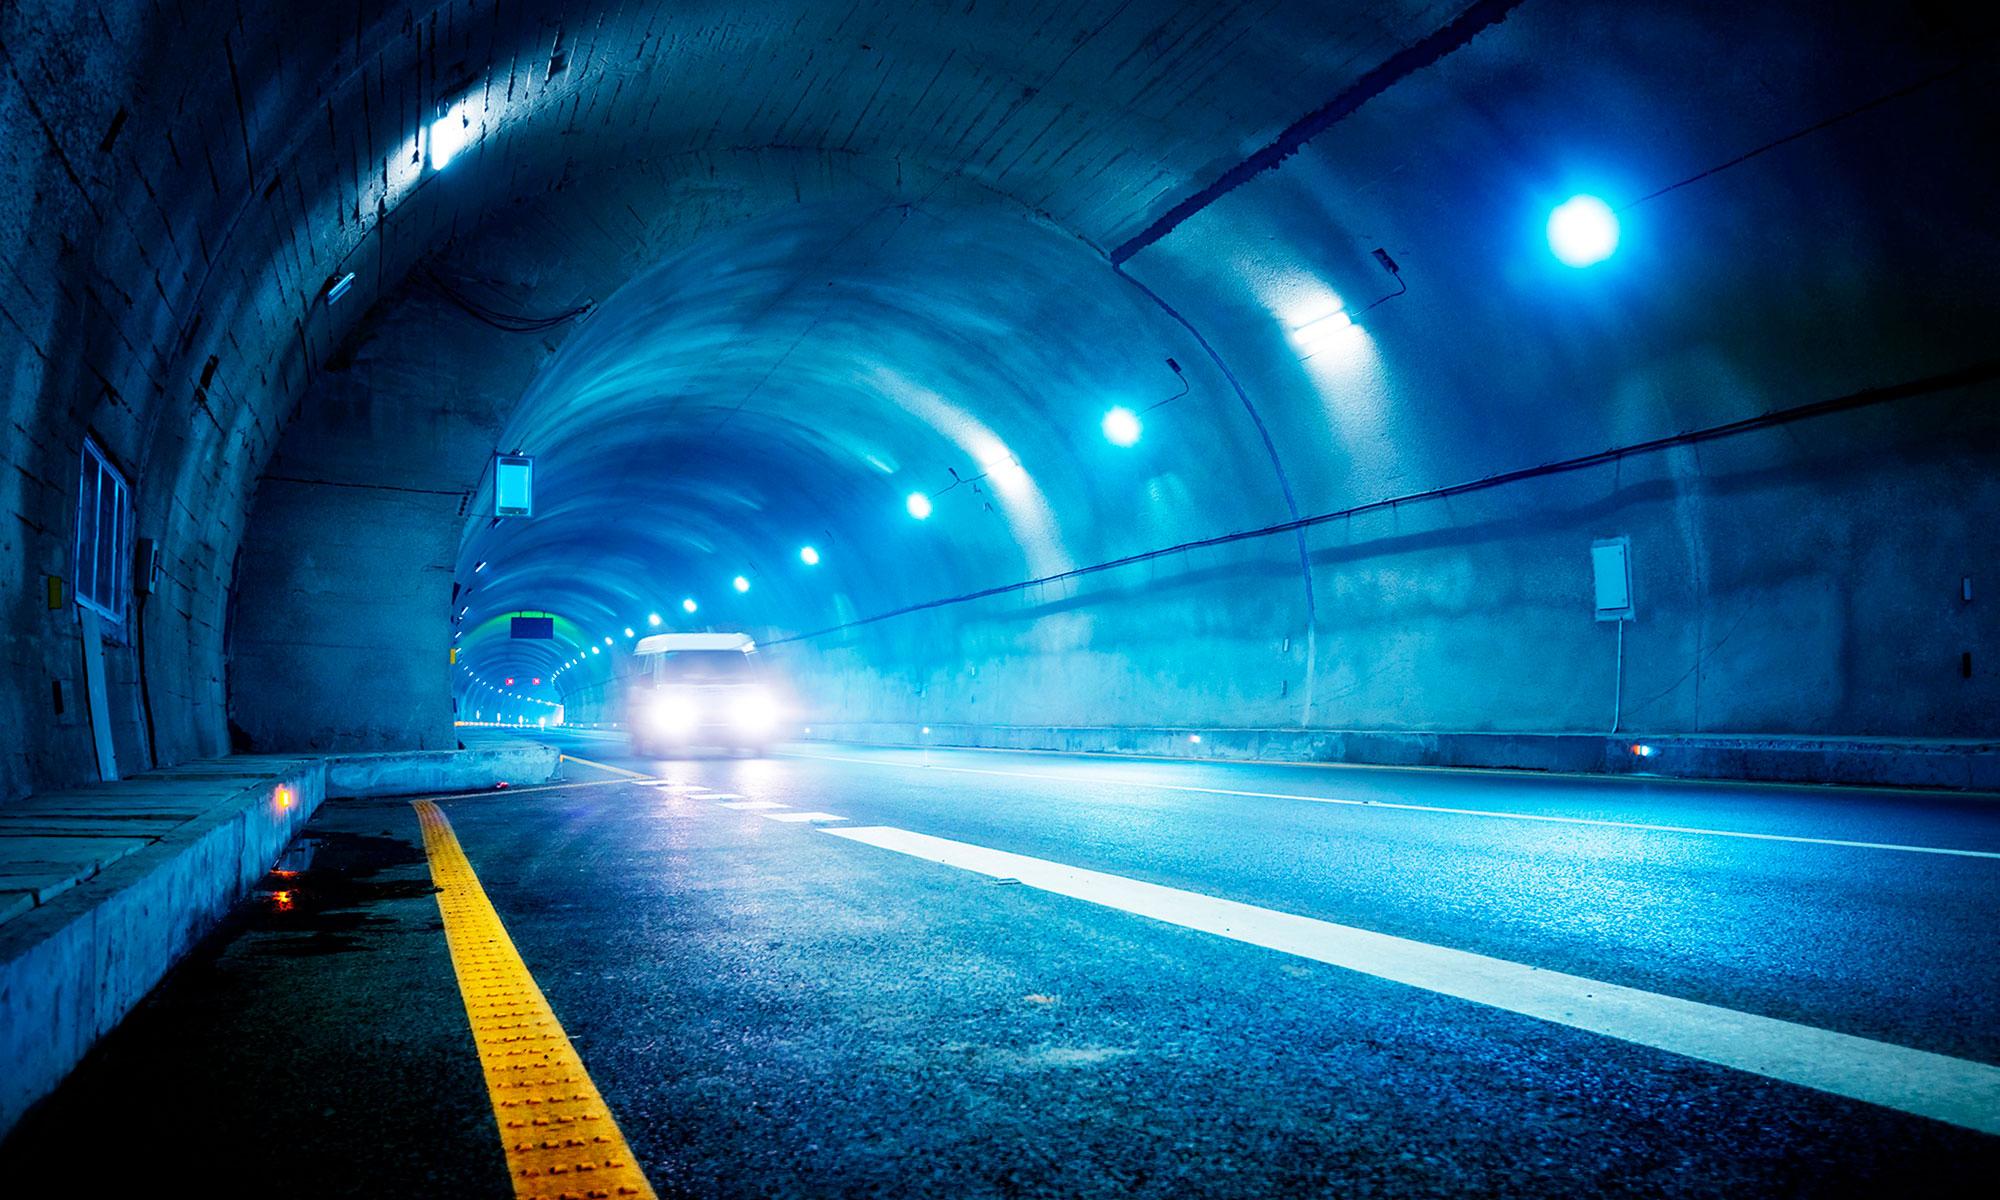 Tunele drogowe